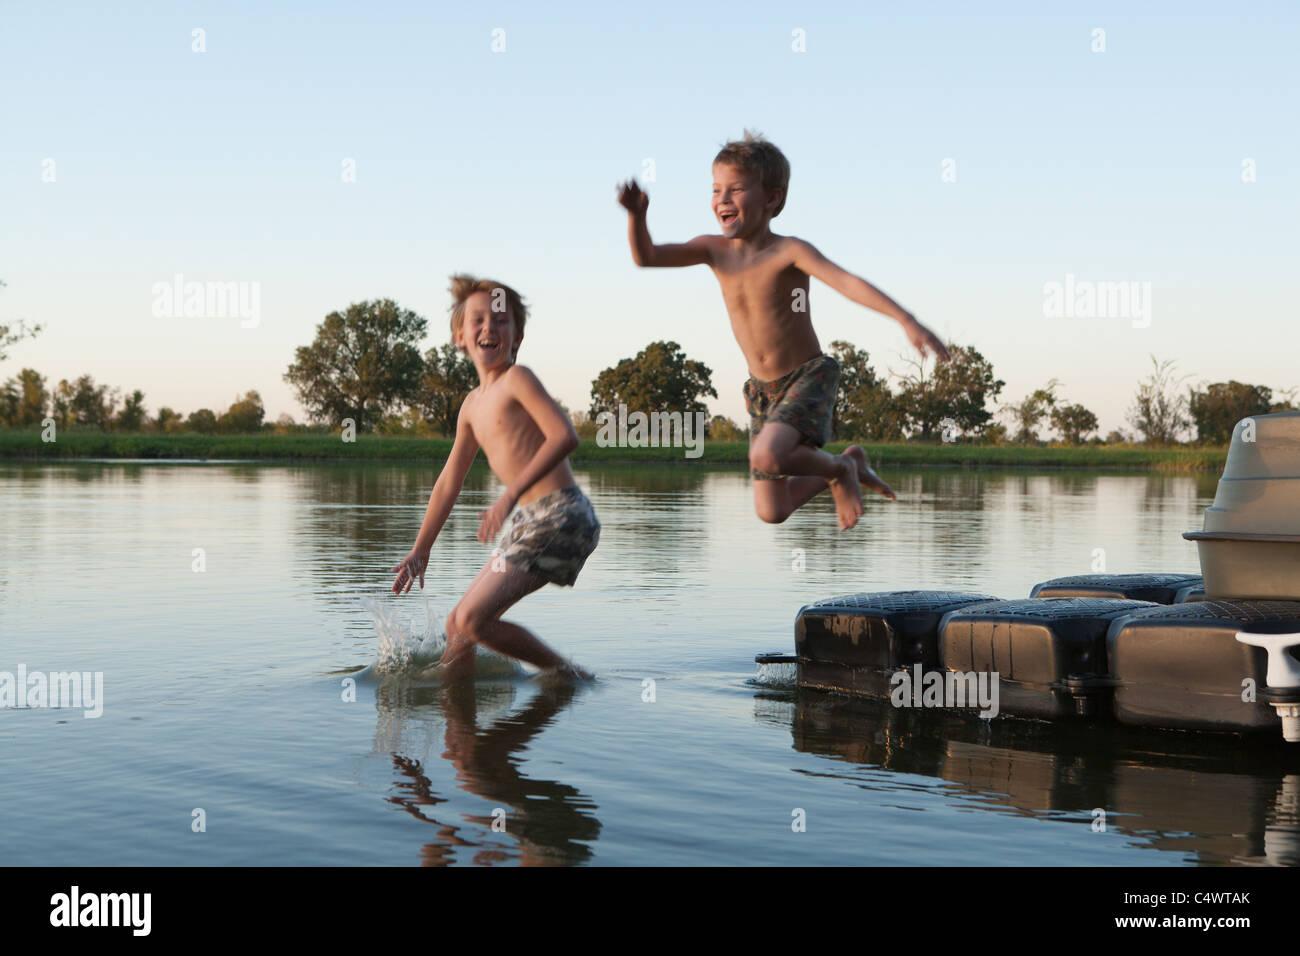 USA,Texas,Texarkana,Two boys (8-9) jumping into lake - Stock Image